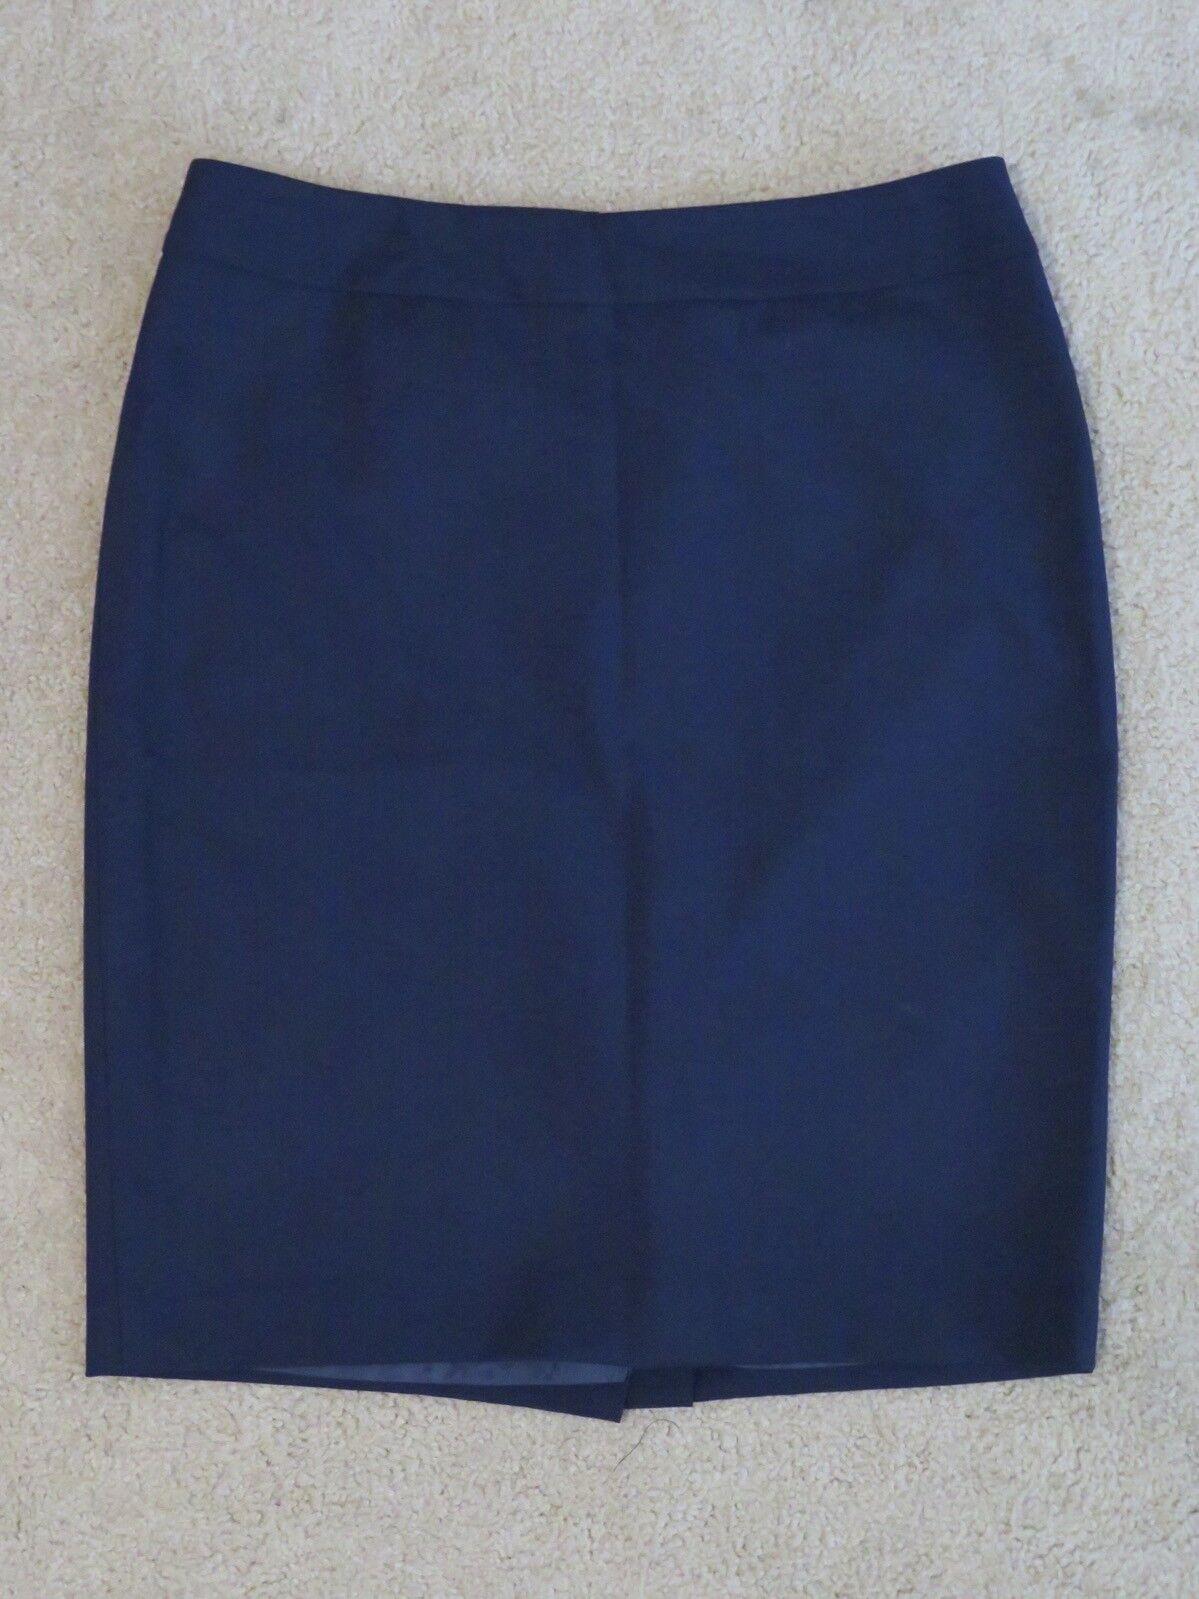 "New Women's Jones New York Collection Stretch ""Lucy  Skirt Navy bluee Hem Size 10"